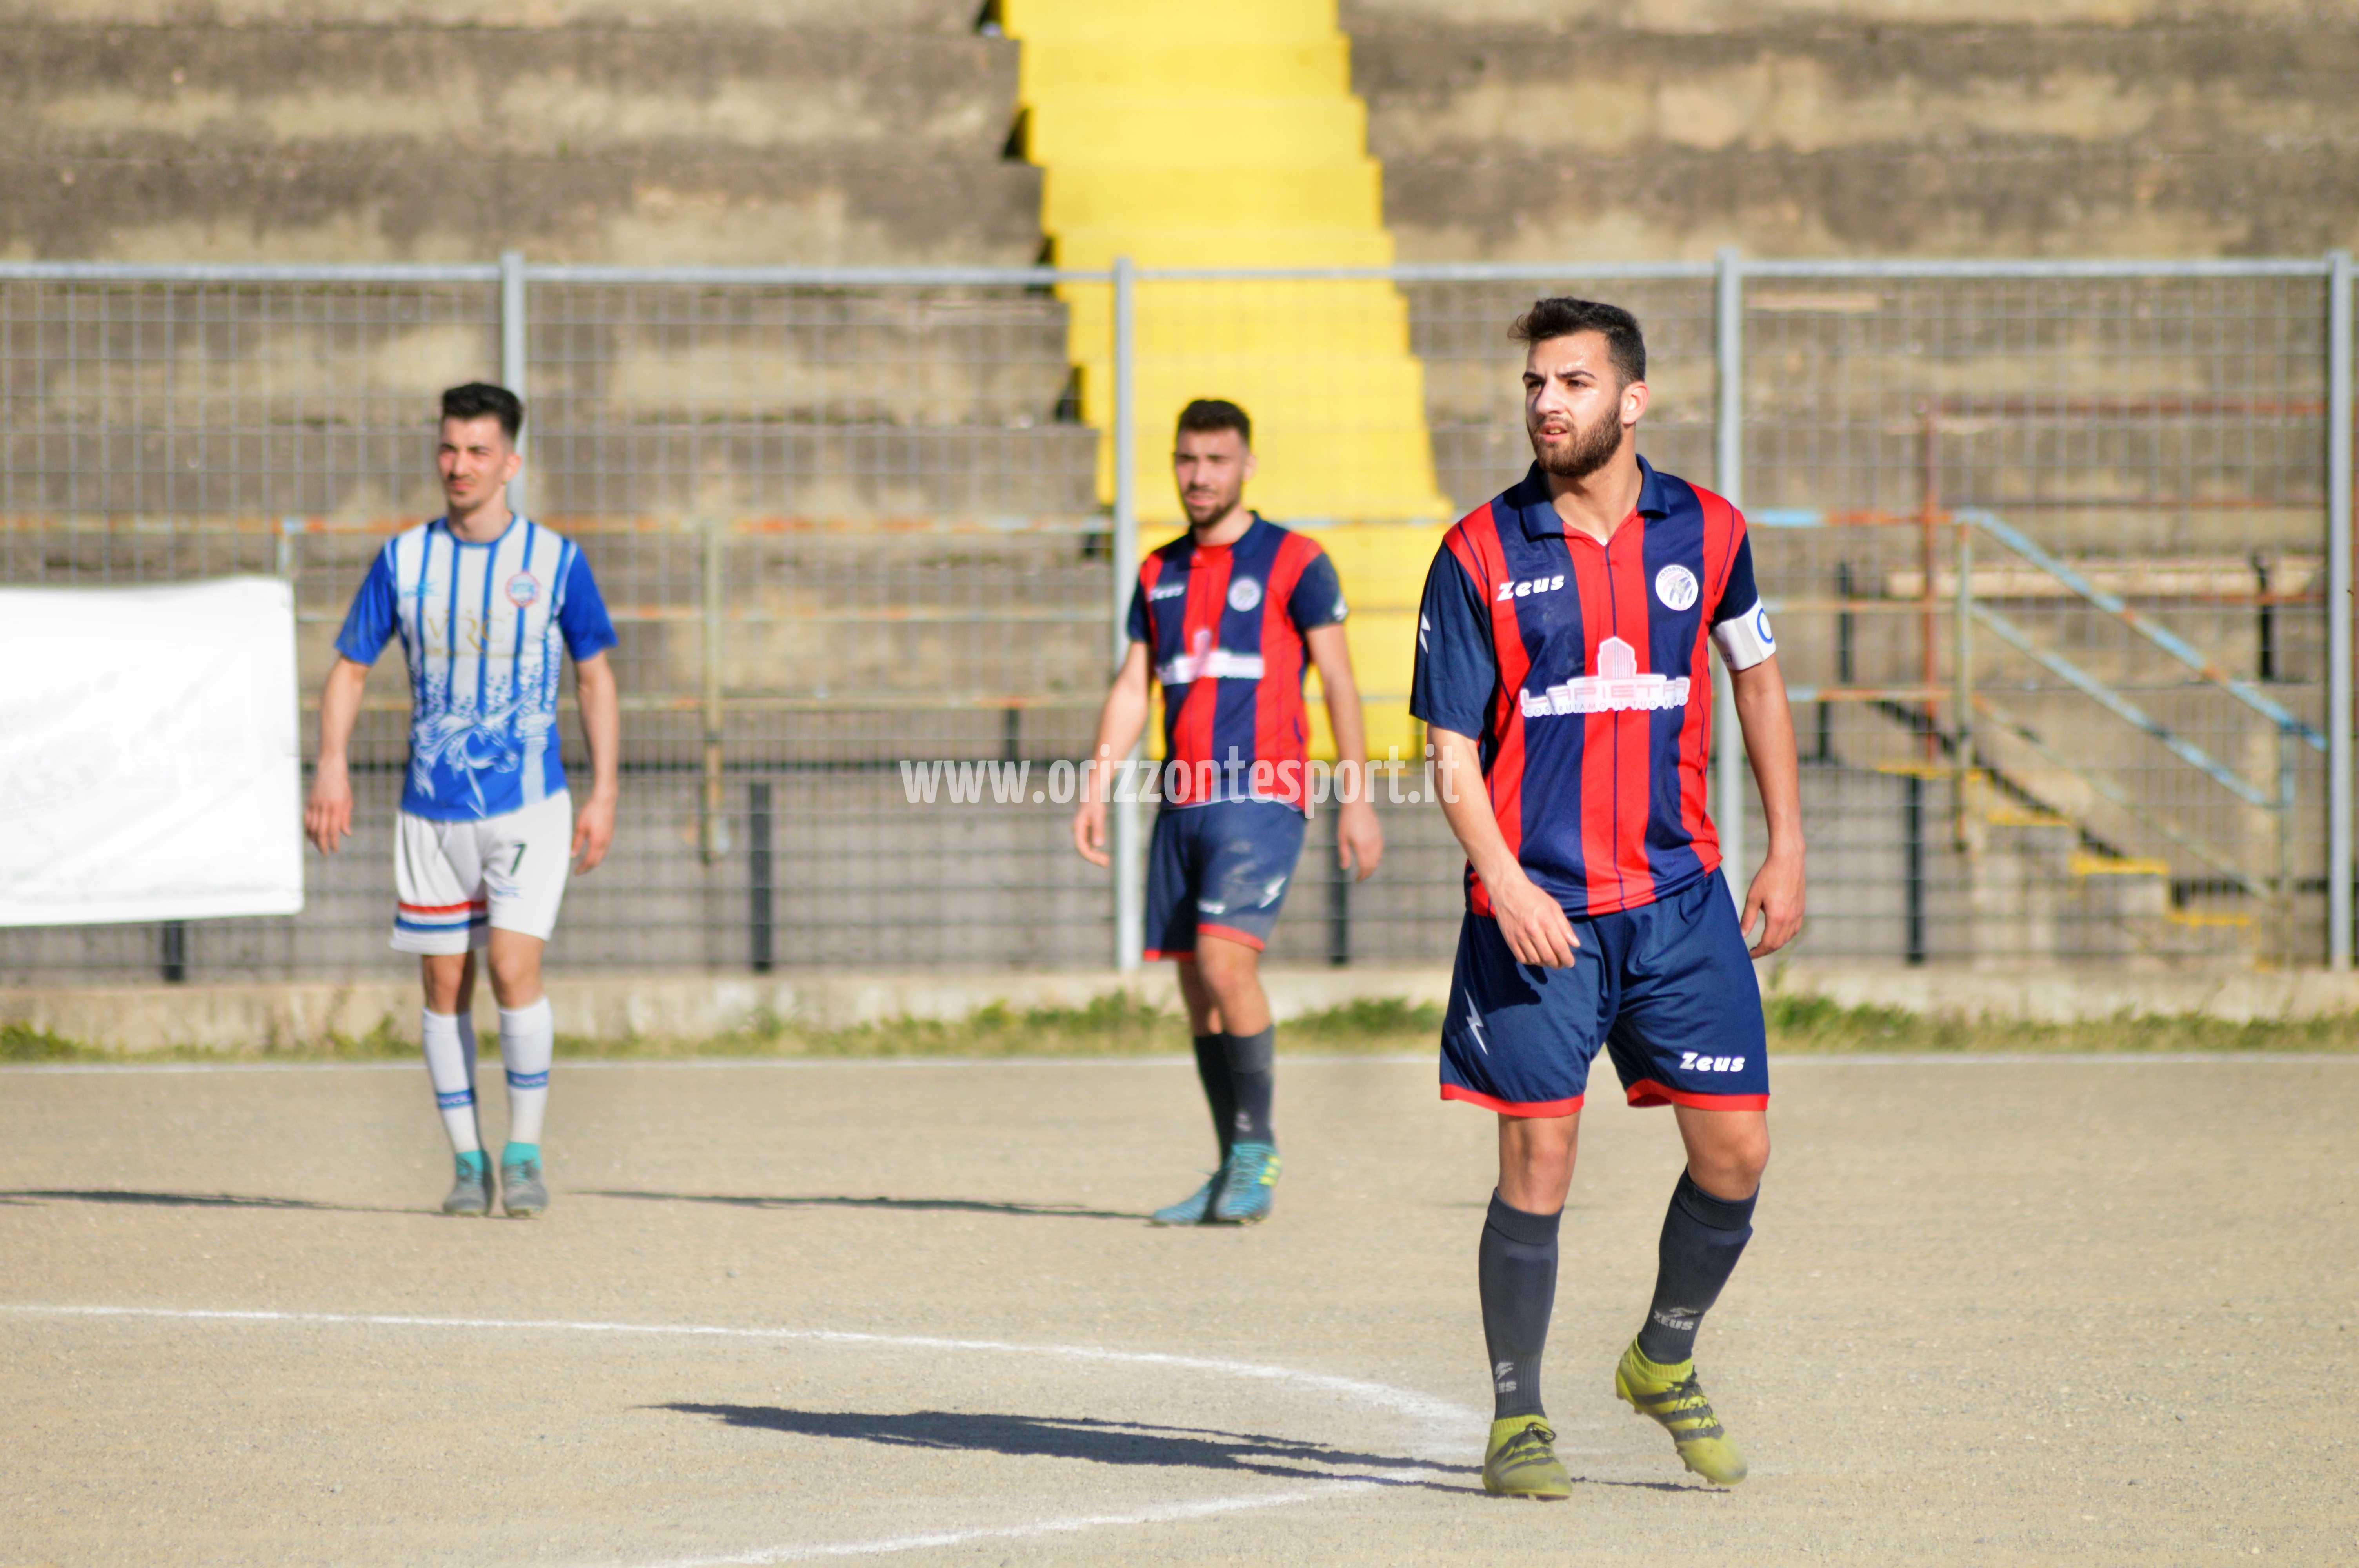 cassano_rossanese (98)